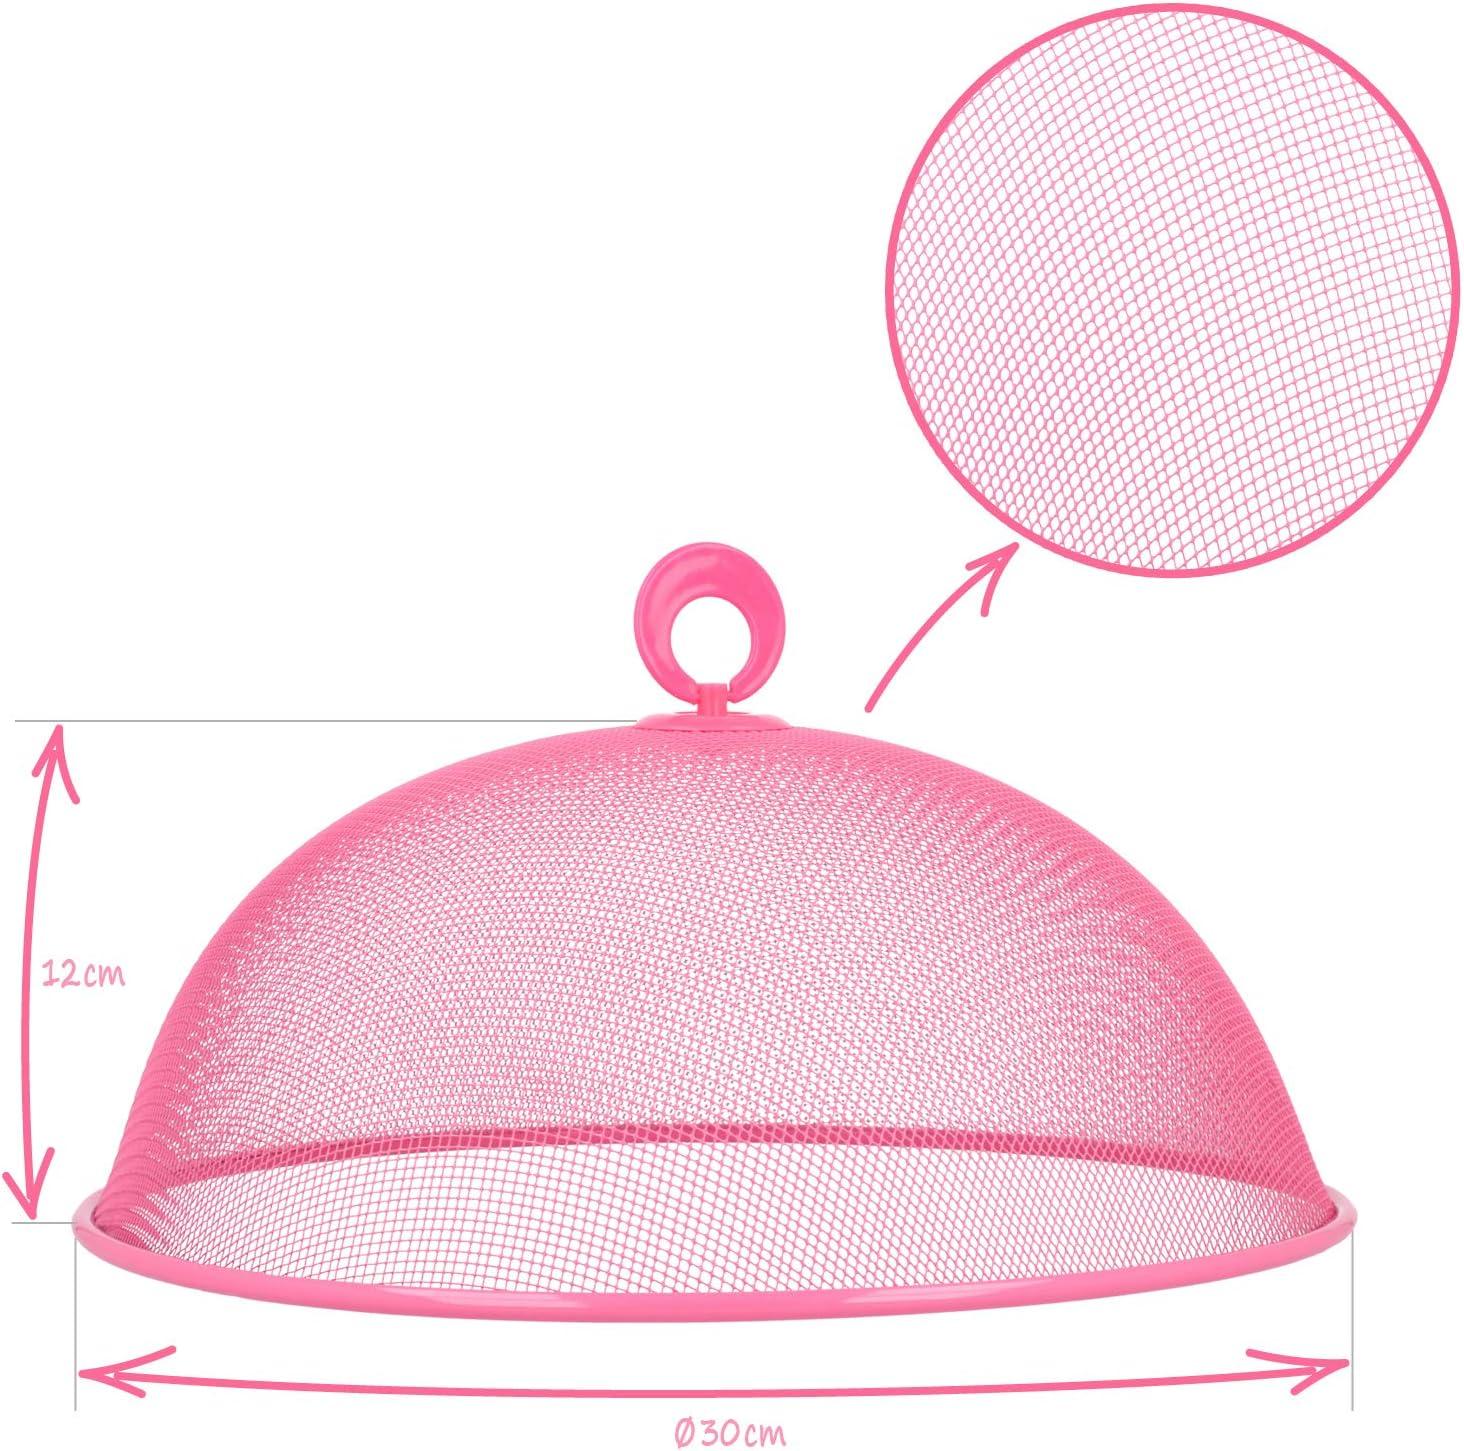 sombrilla de comedor colorida COM-FOUR/® cubierta 2x para alimentos /Ø 30 cm caperuza met/álica